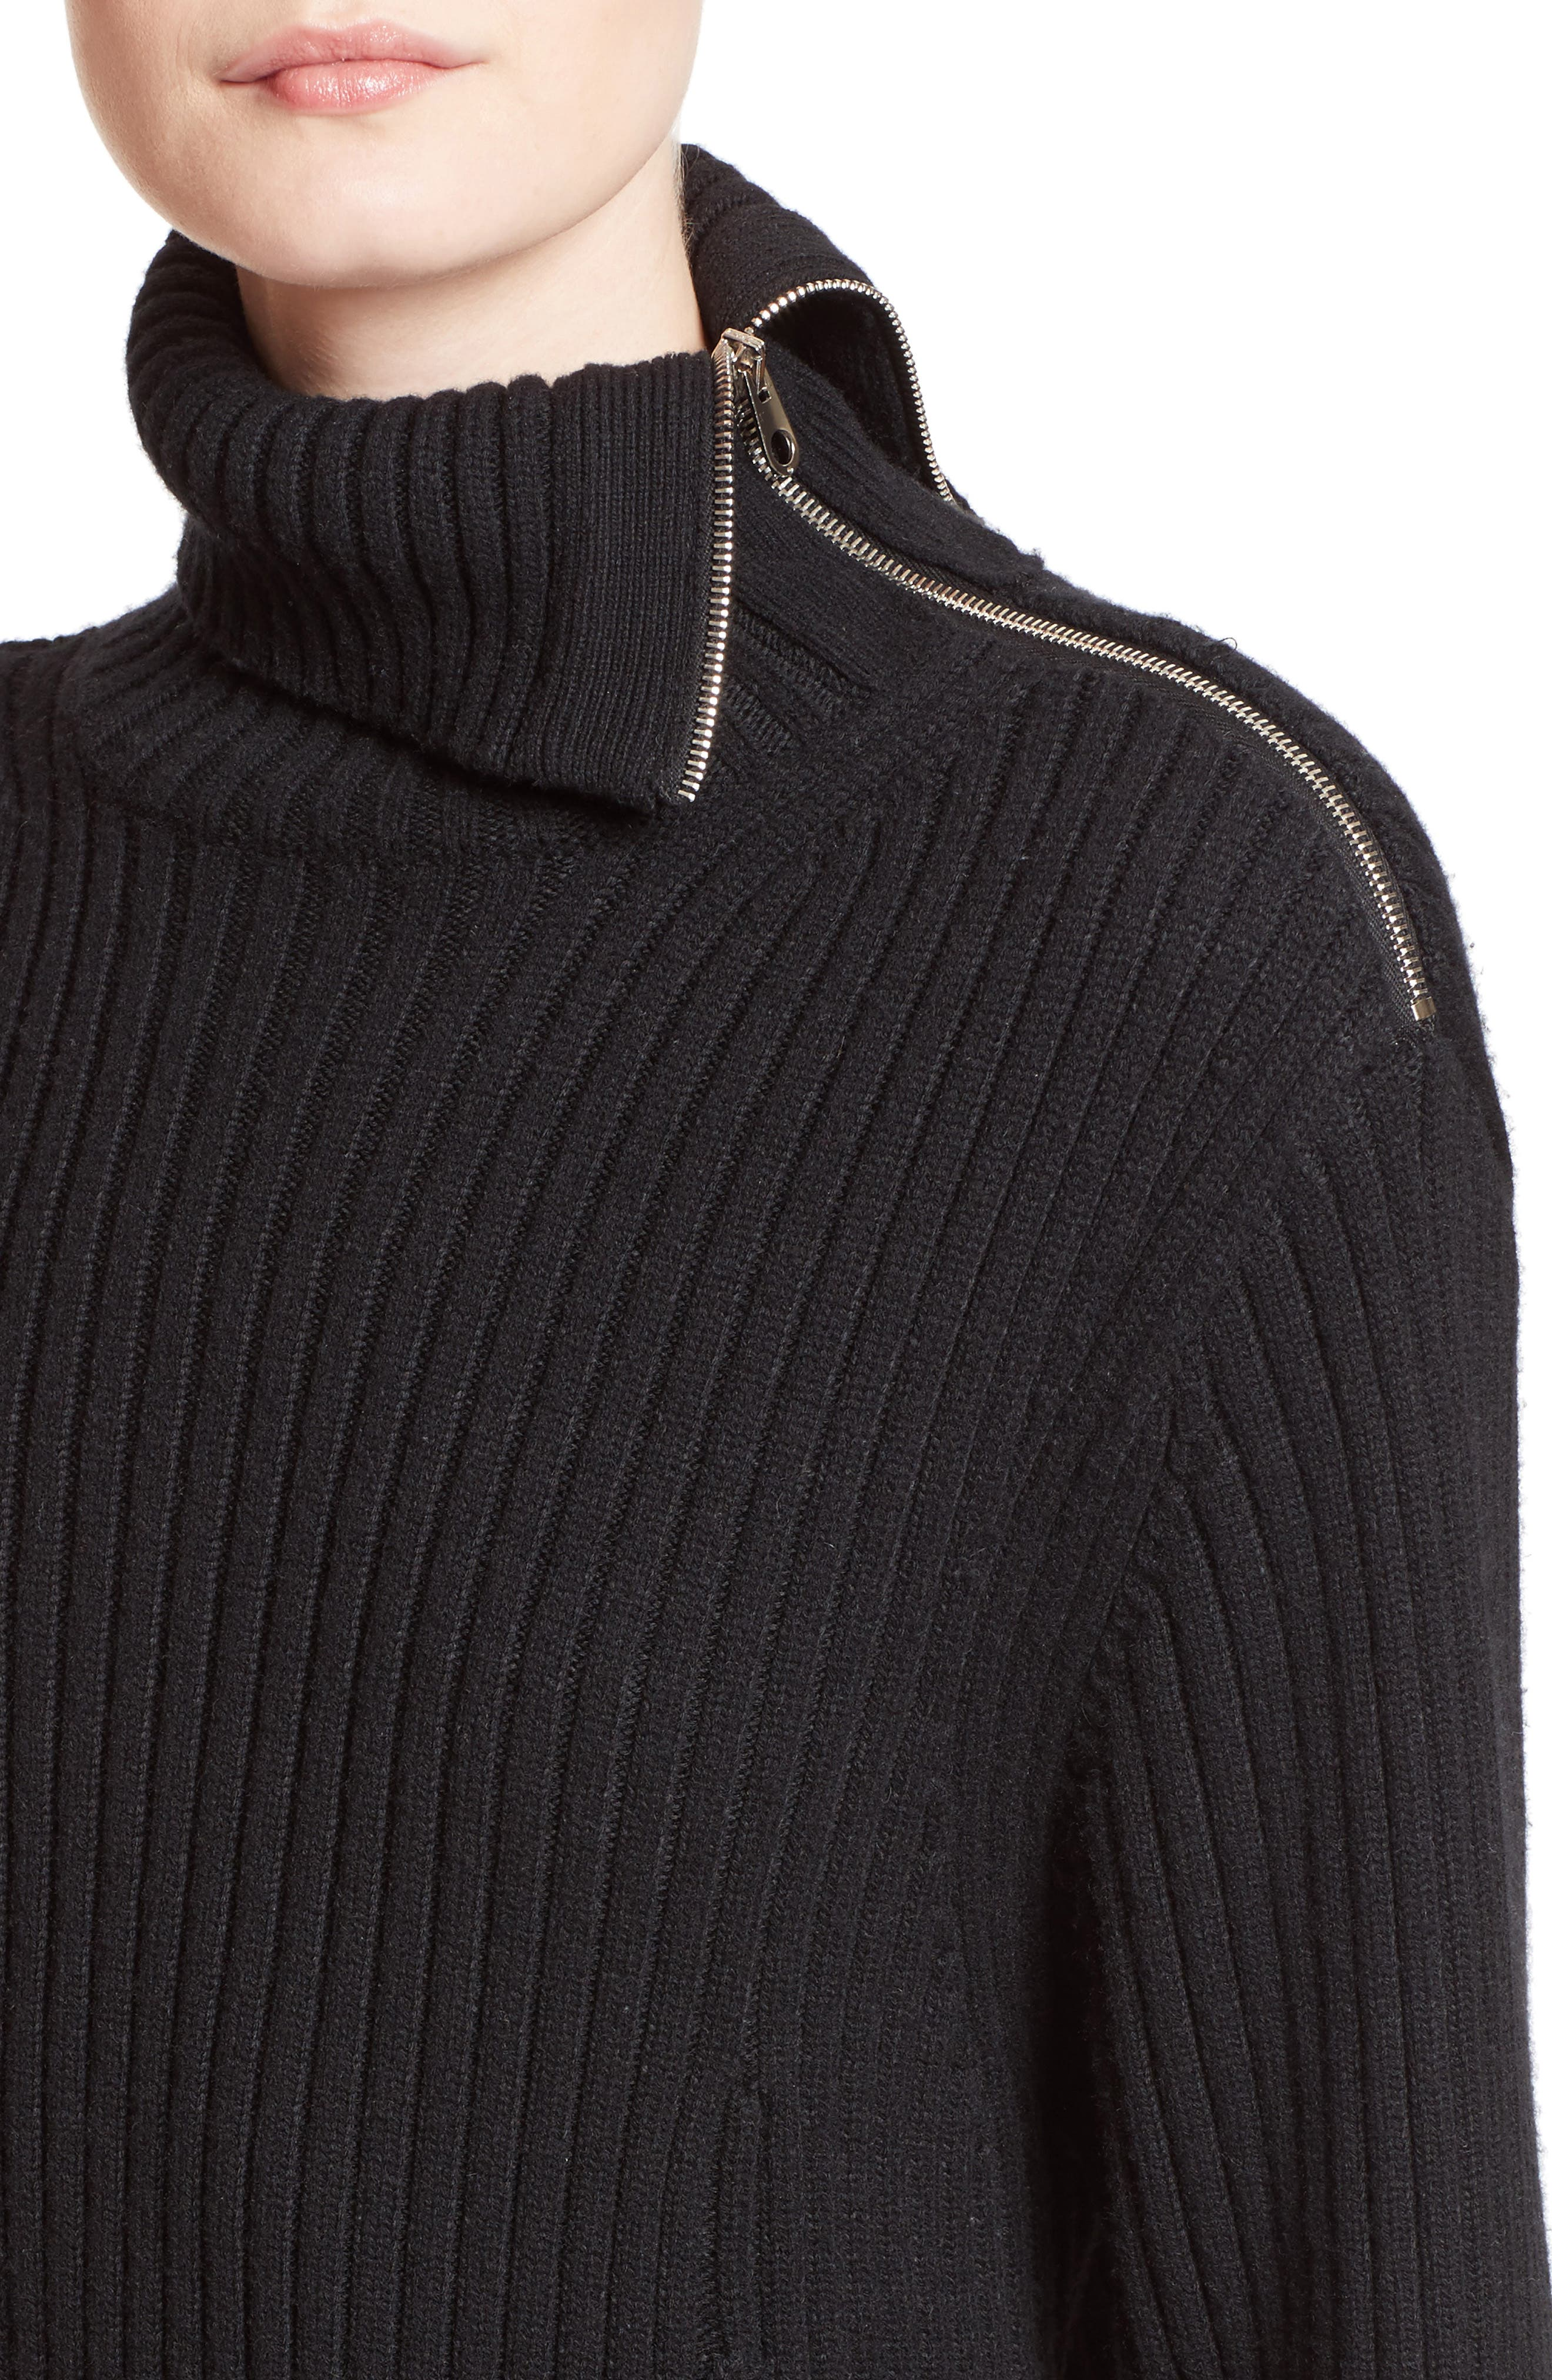 Alternate Image 5  - Proenza Schouler Wool & Cashmere Blend Turtleneck Dress